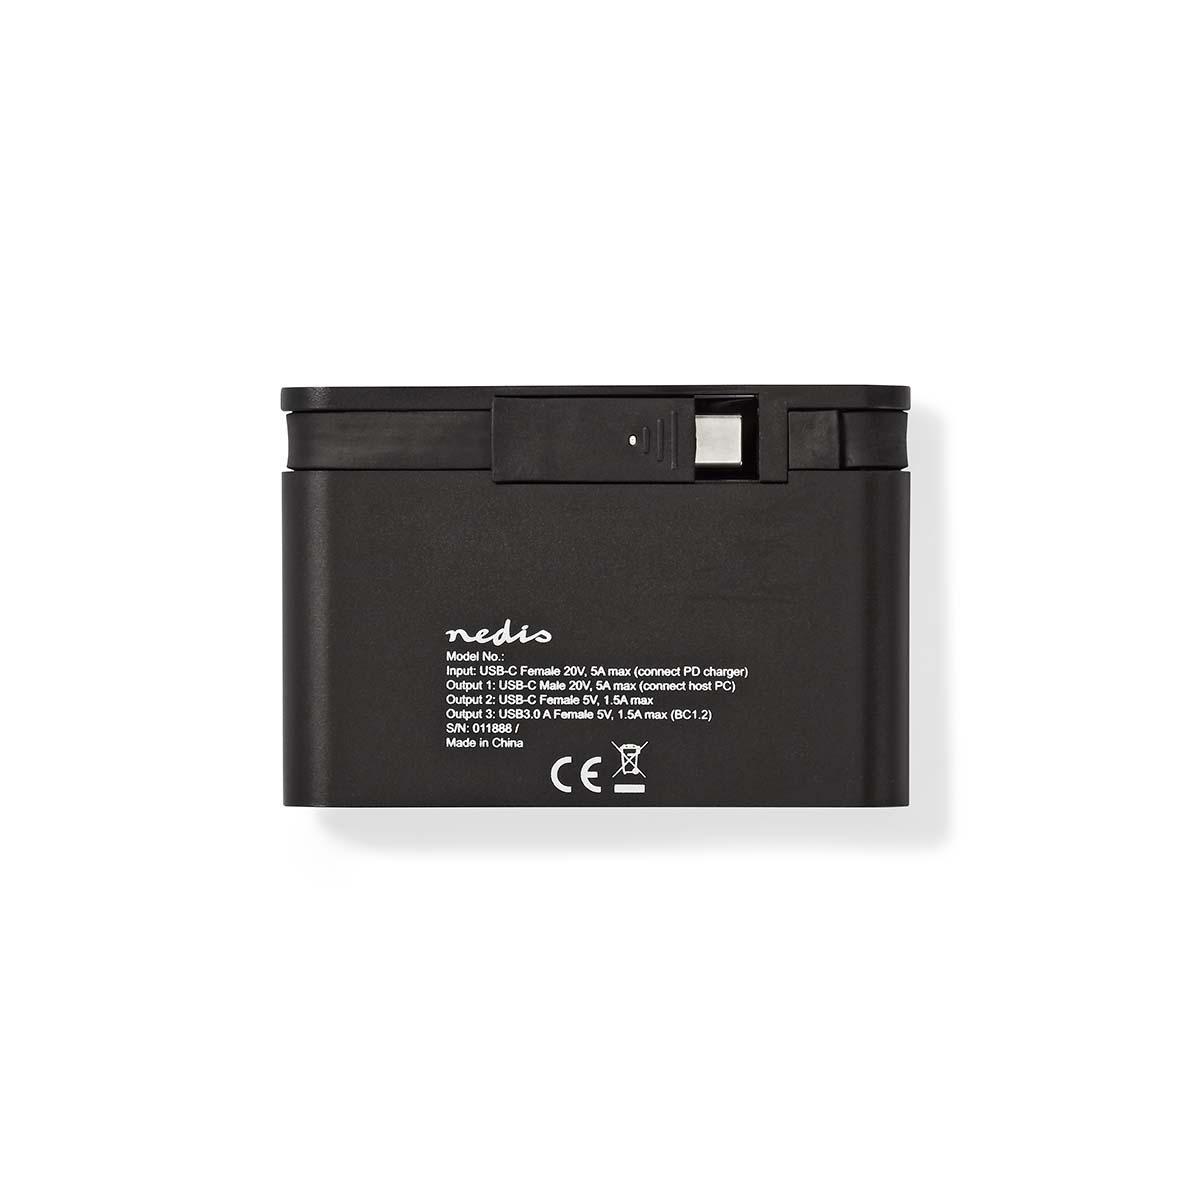 USB-C Thunderbolt 3 for MacBook Pro to USB-C, USB 3.0, HDMI & Gigabit Ethernet